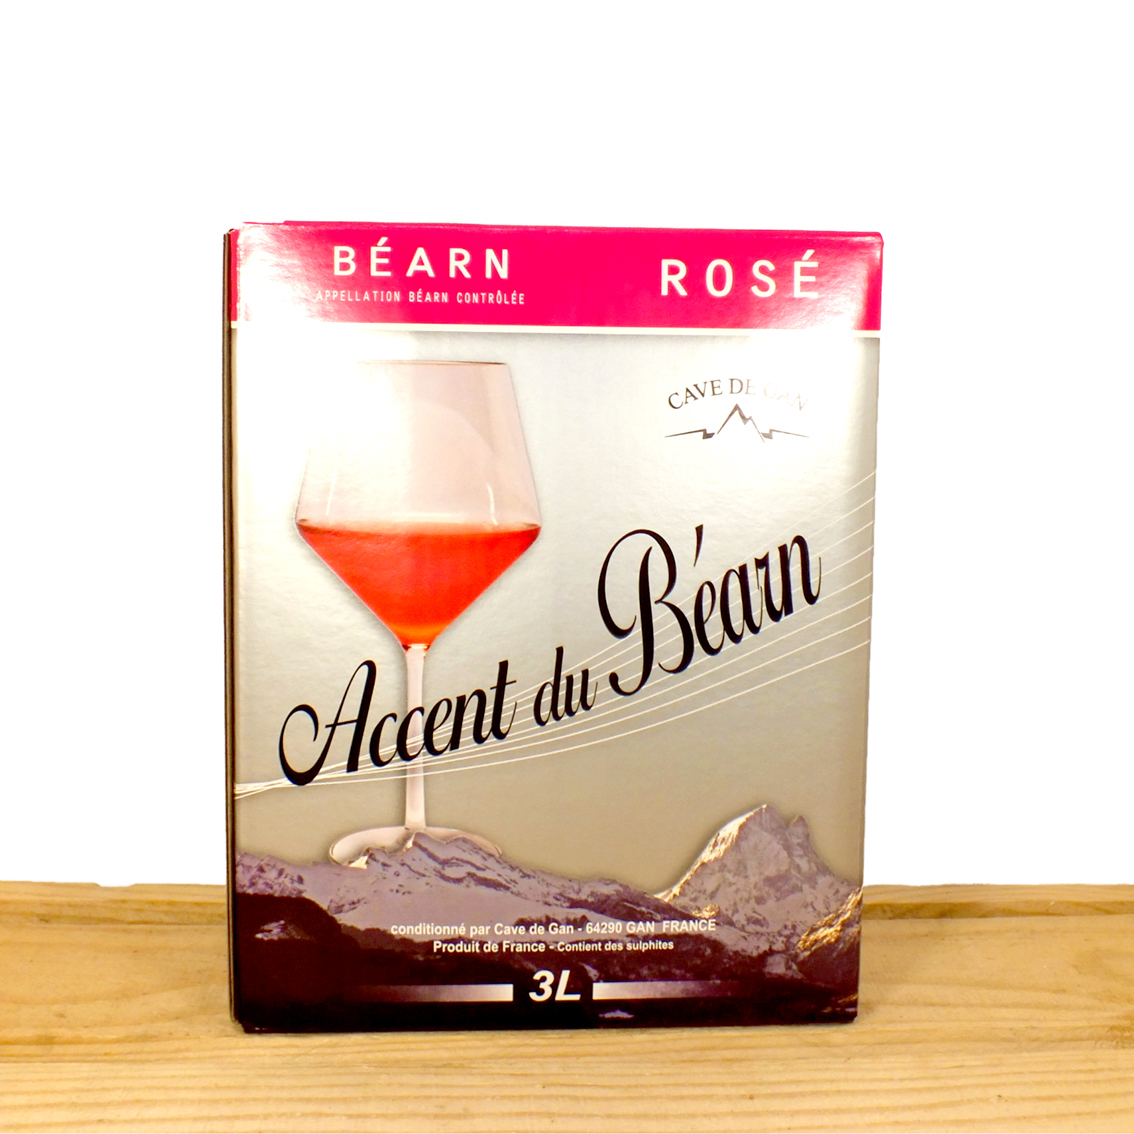 Accent du béarn jurancon rosé